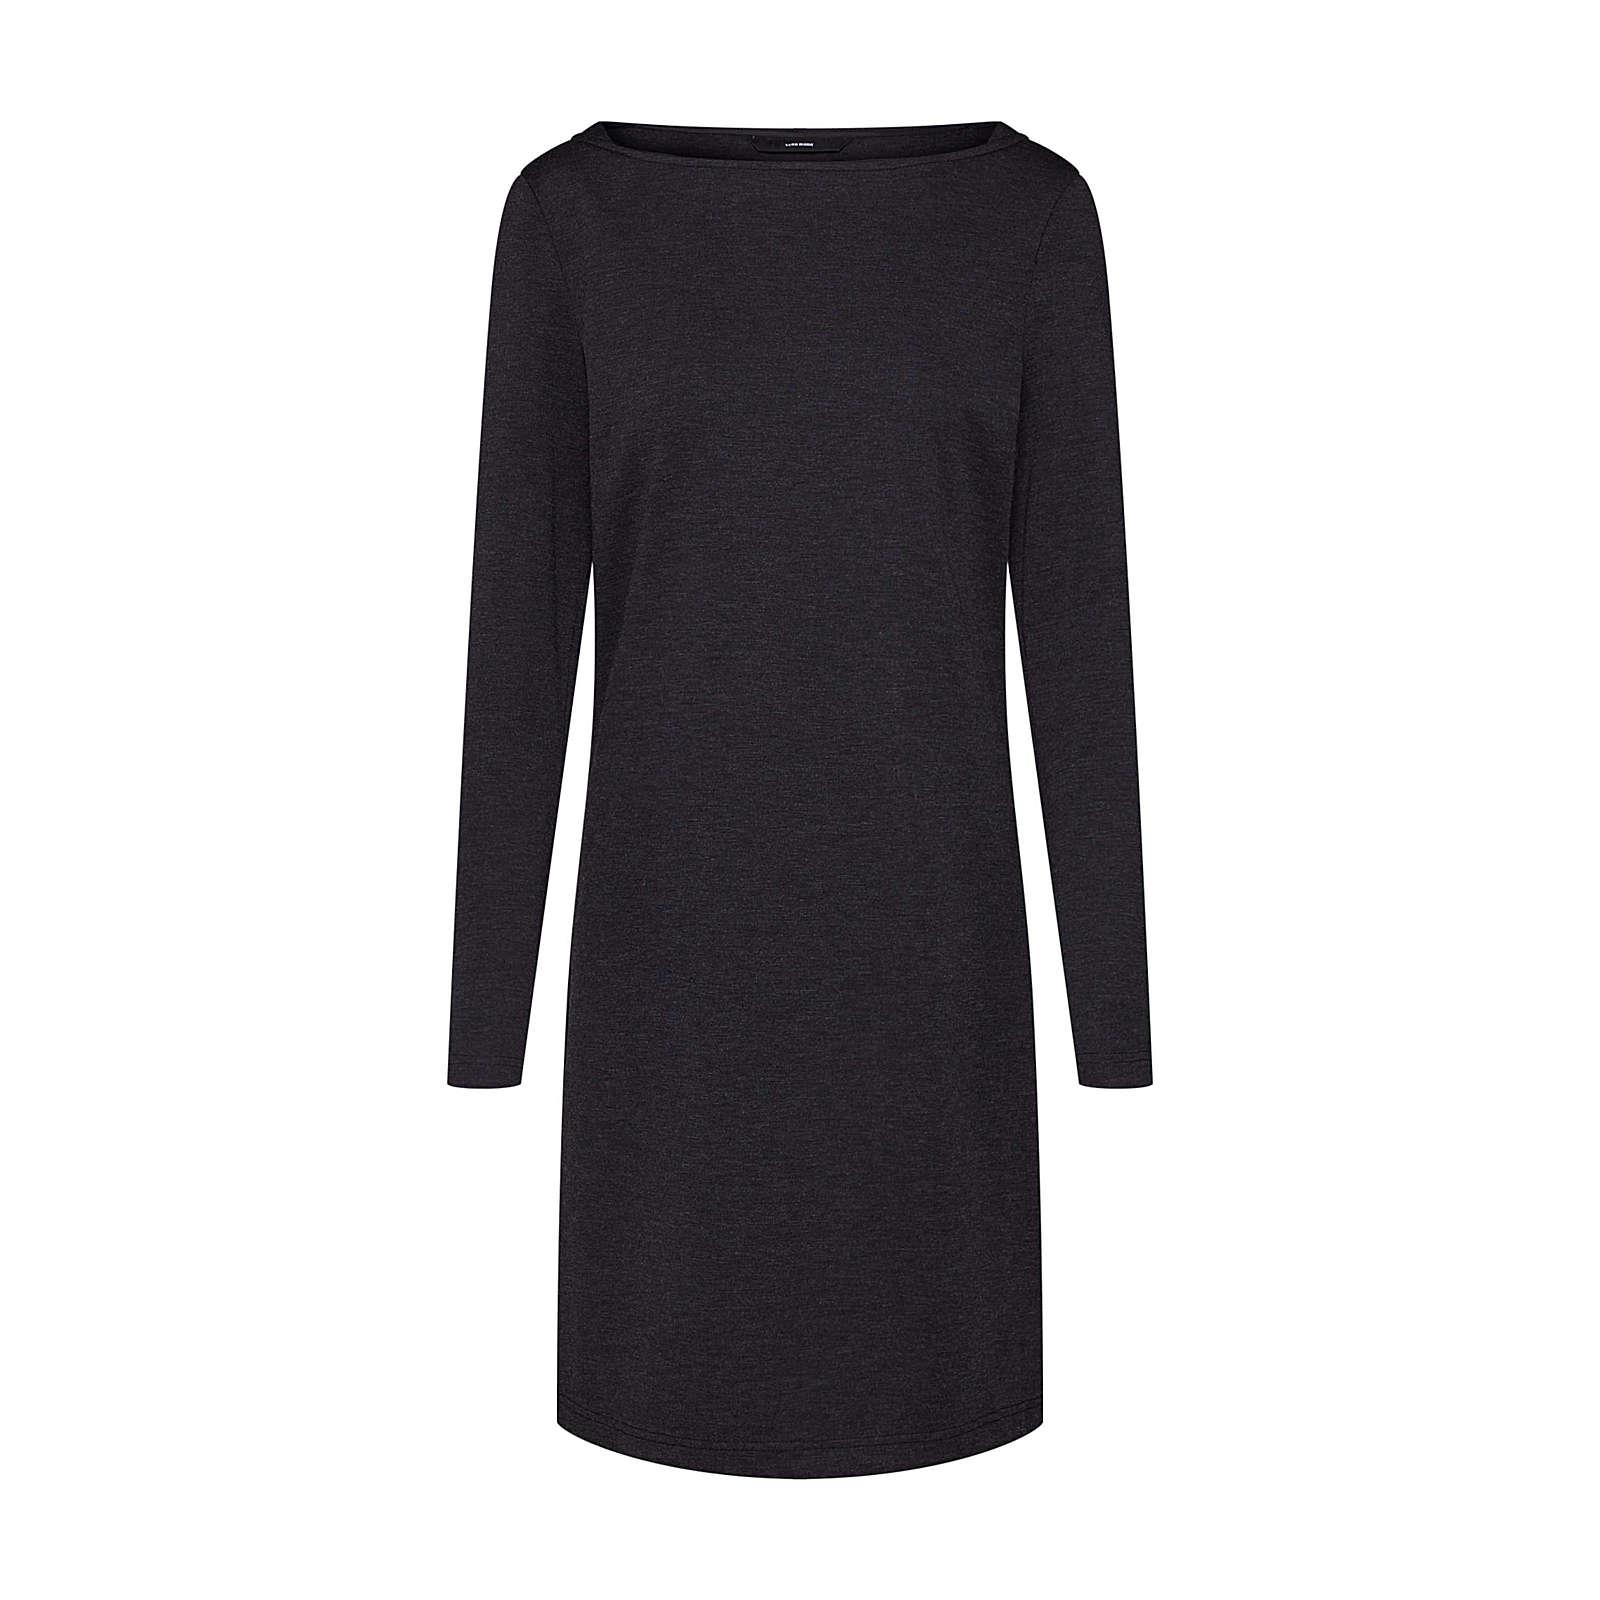 VERO MODA Kleid VMTAILOR LS ABK DRESS Jerseykleider dunkelgrau Damen Gr. 38